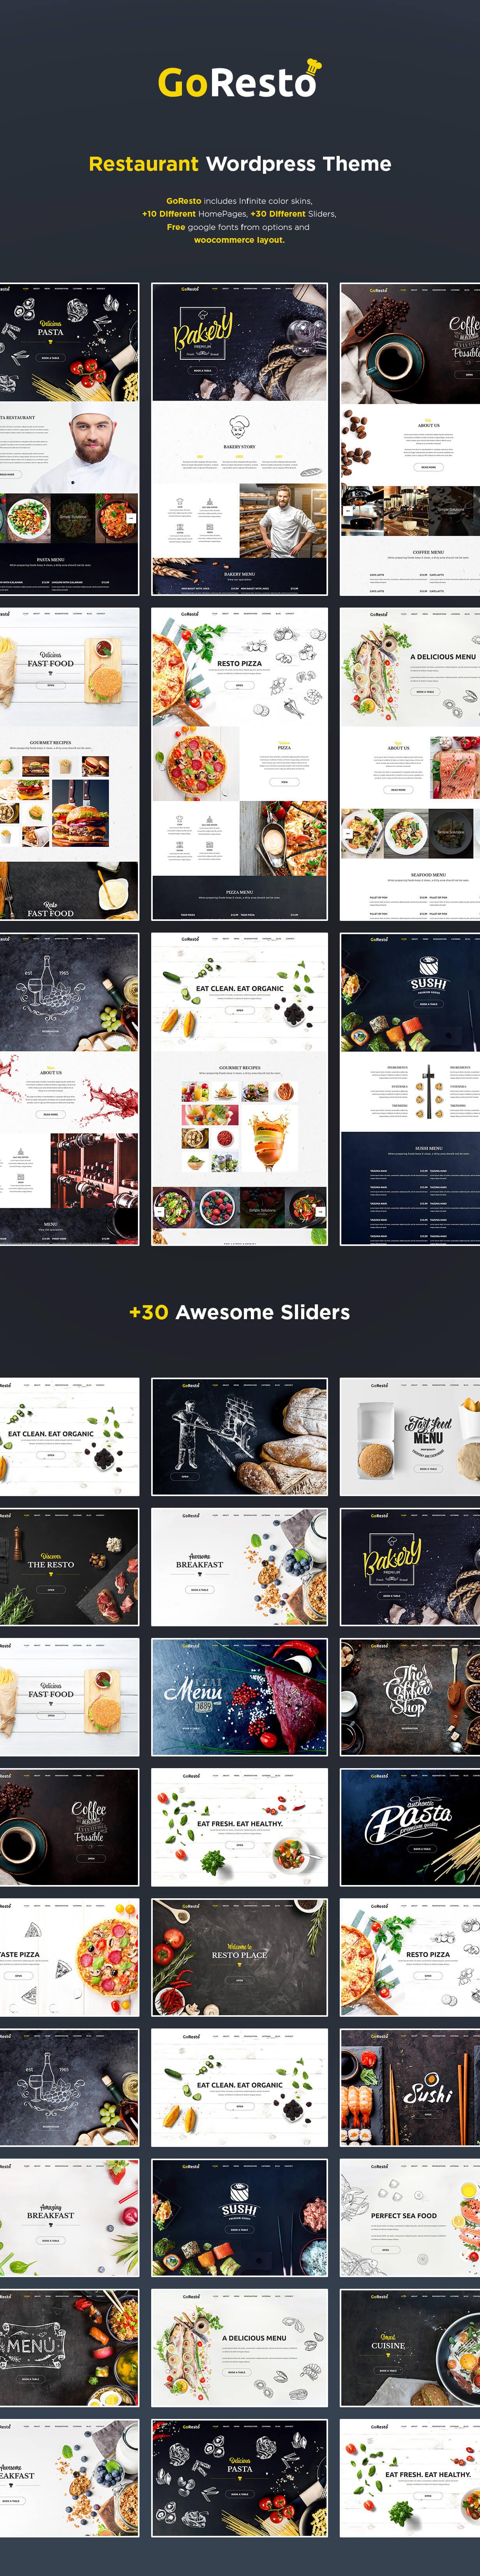 GoResto – Multipurpose Restaurant & Table Booking WordPress Theme - 4